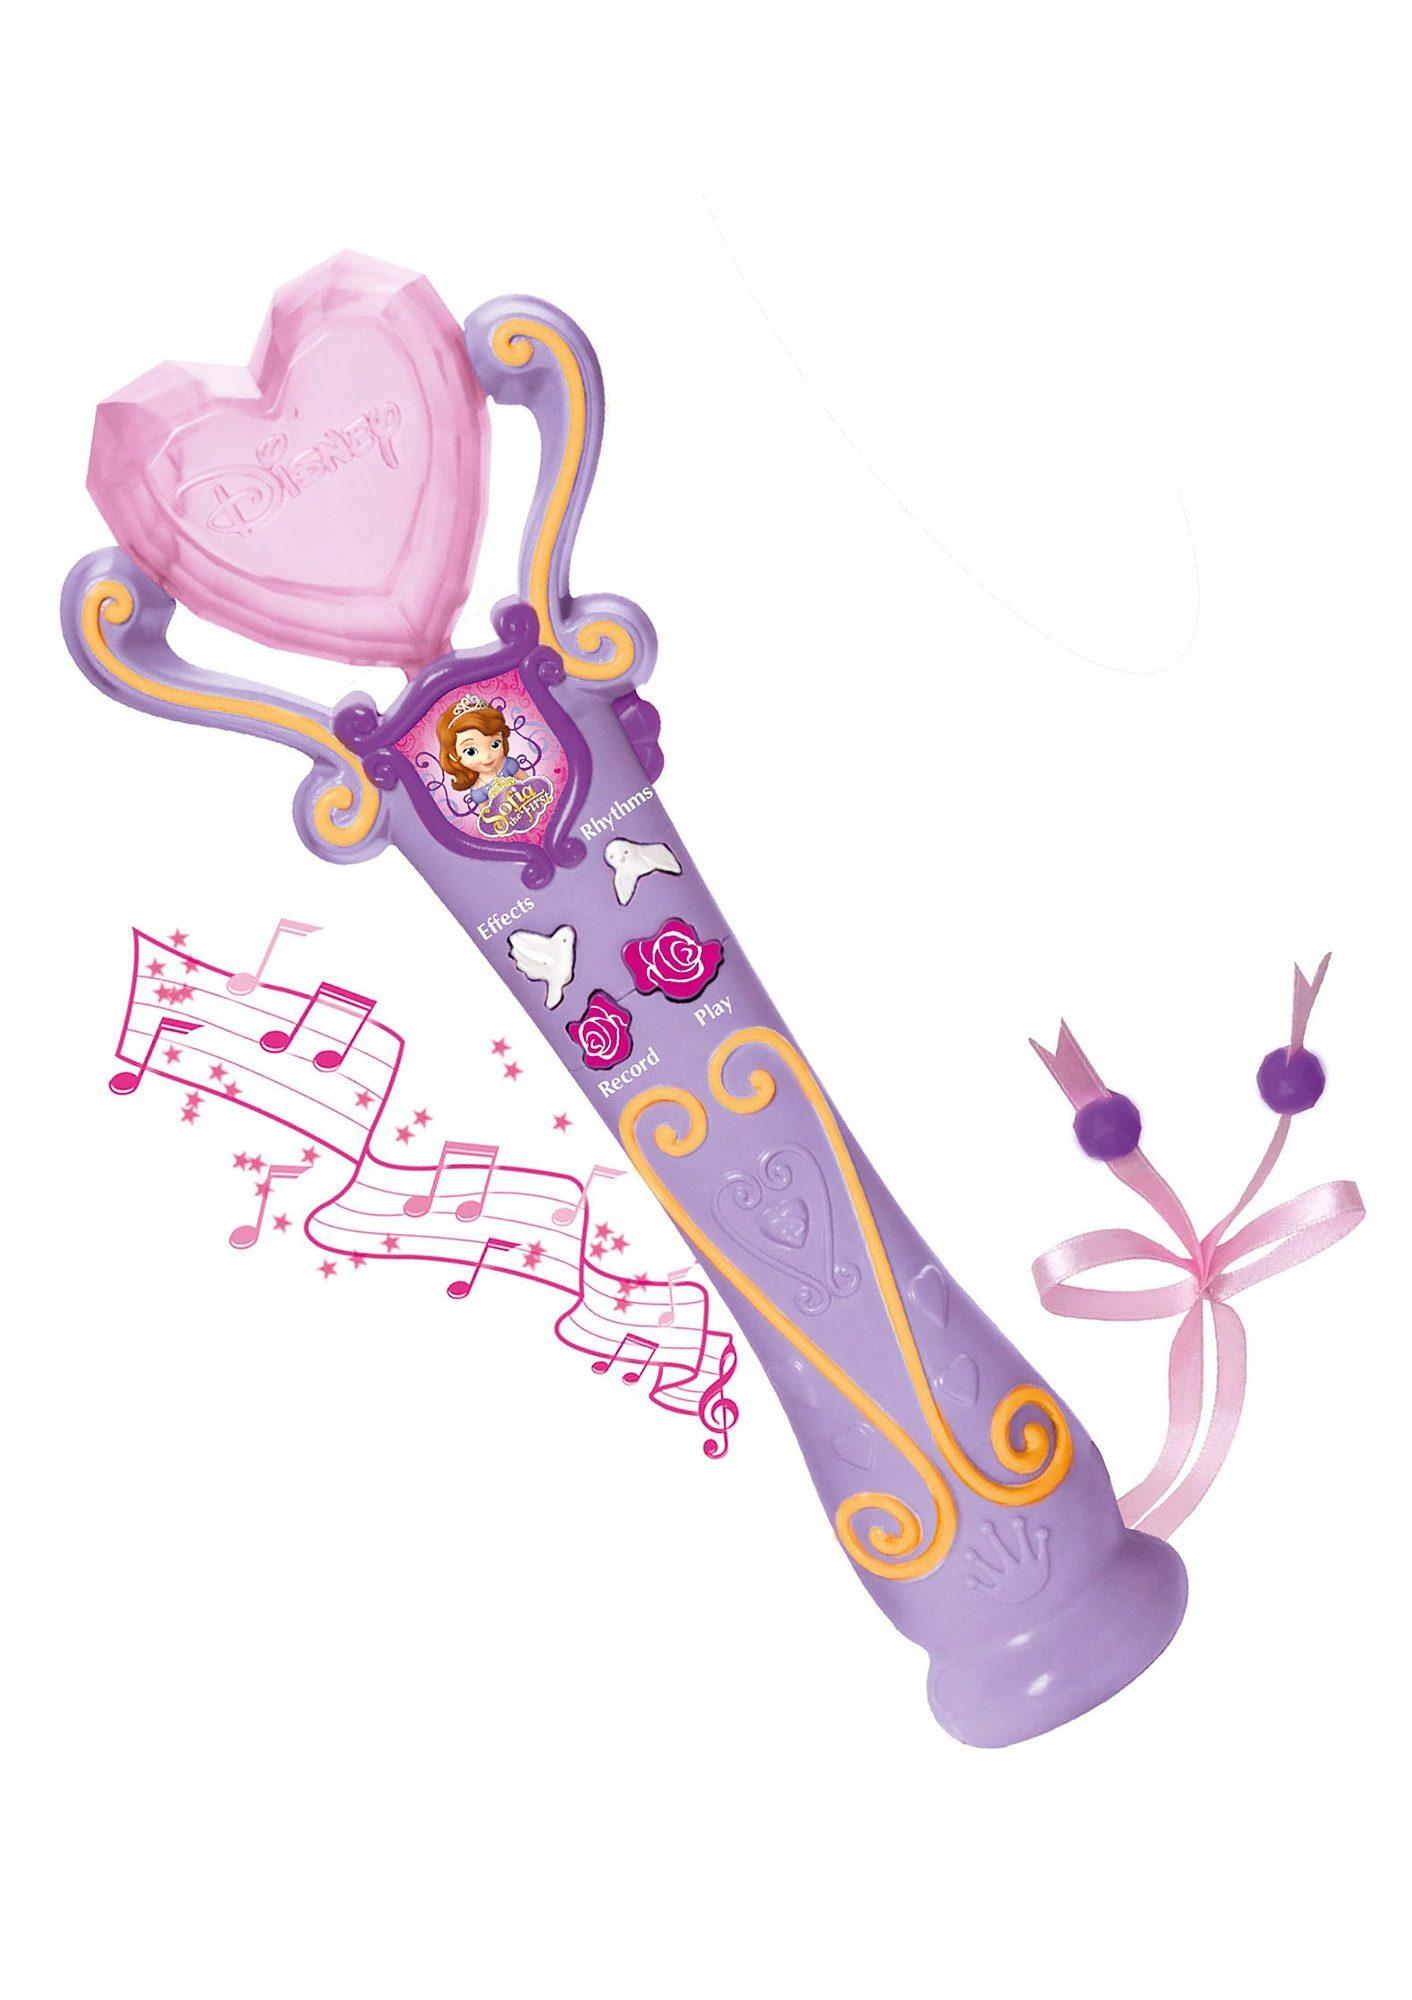 IMC Toys Kinder-Handmikrofon »Sofia die Erste«